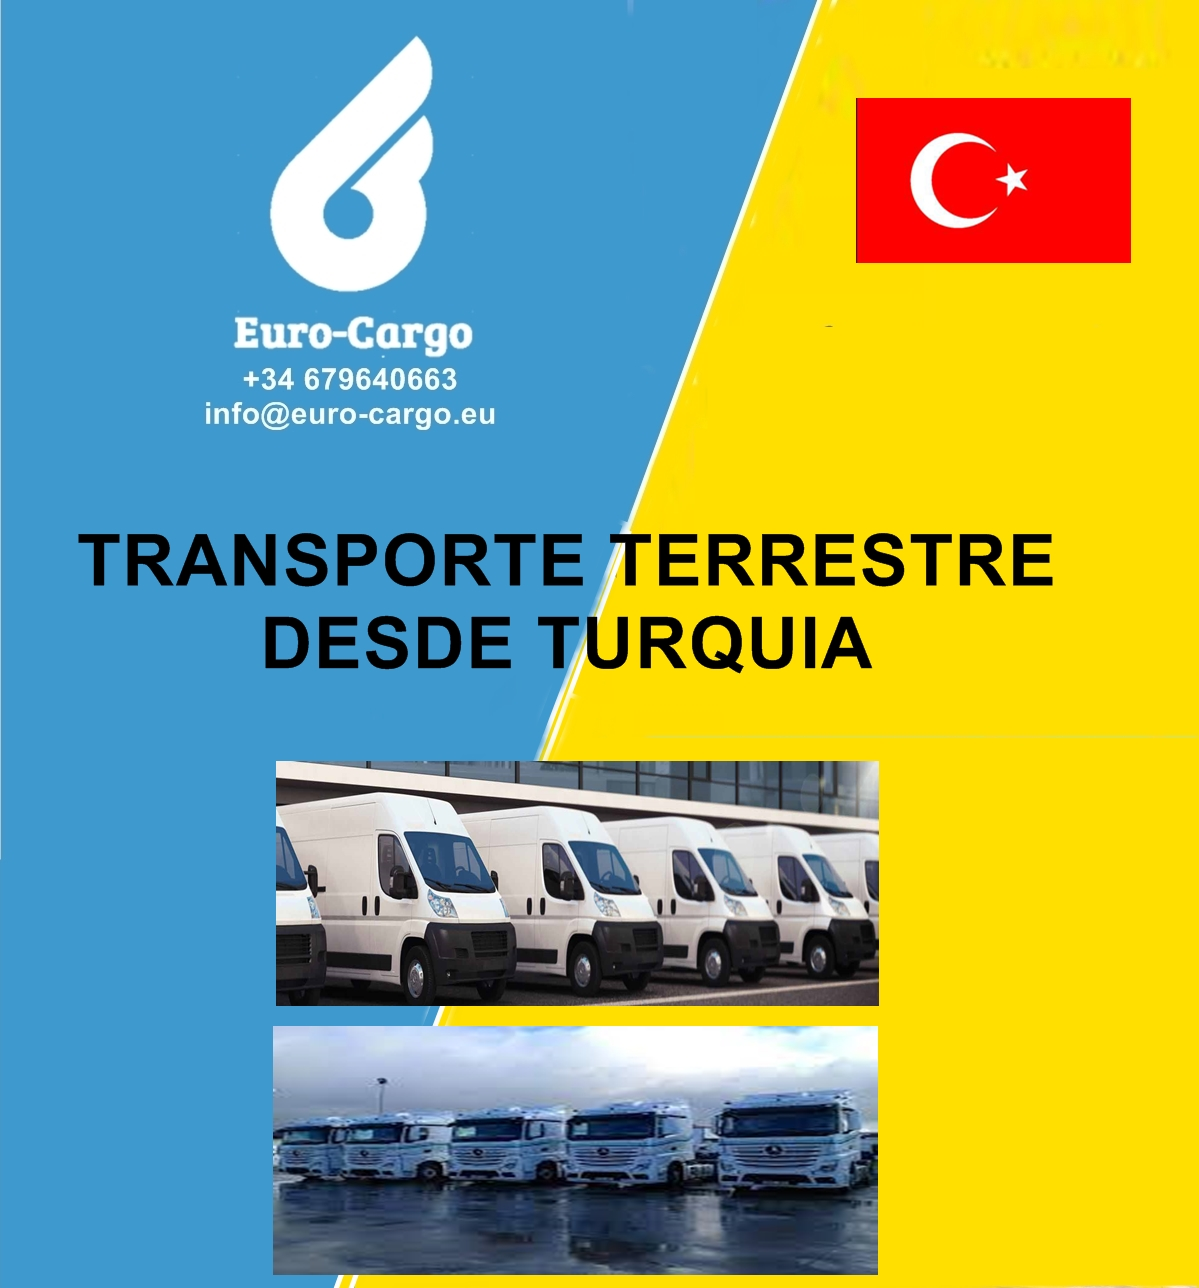 Transporte-desde-Turquia.jpg